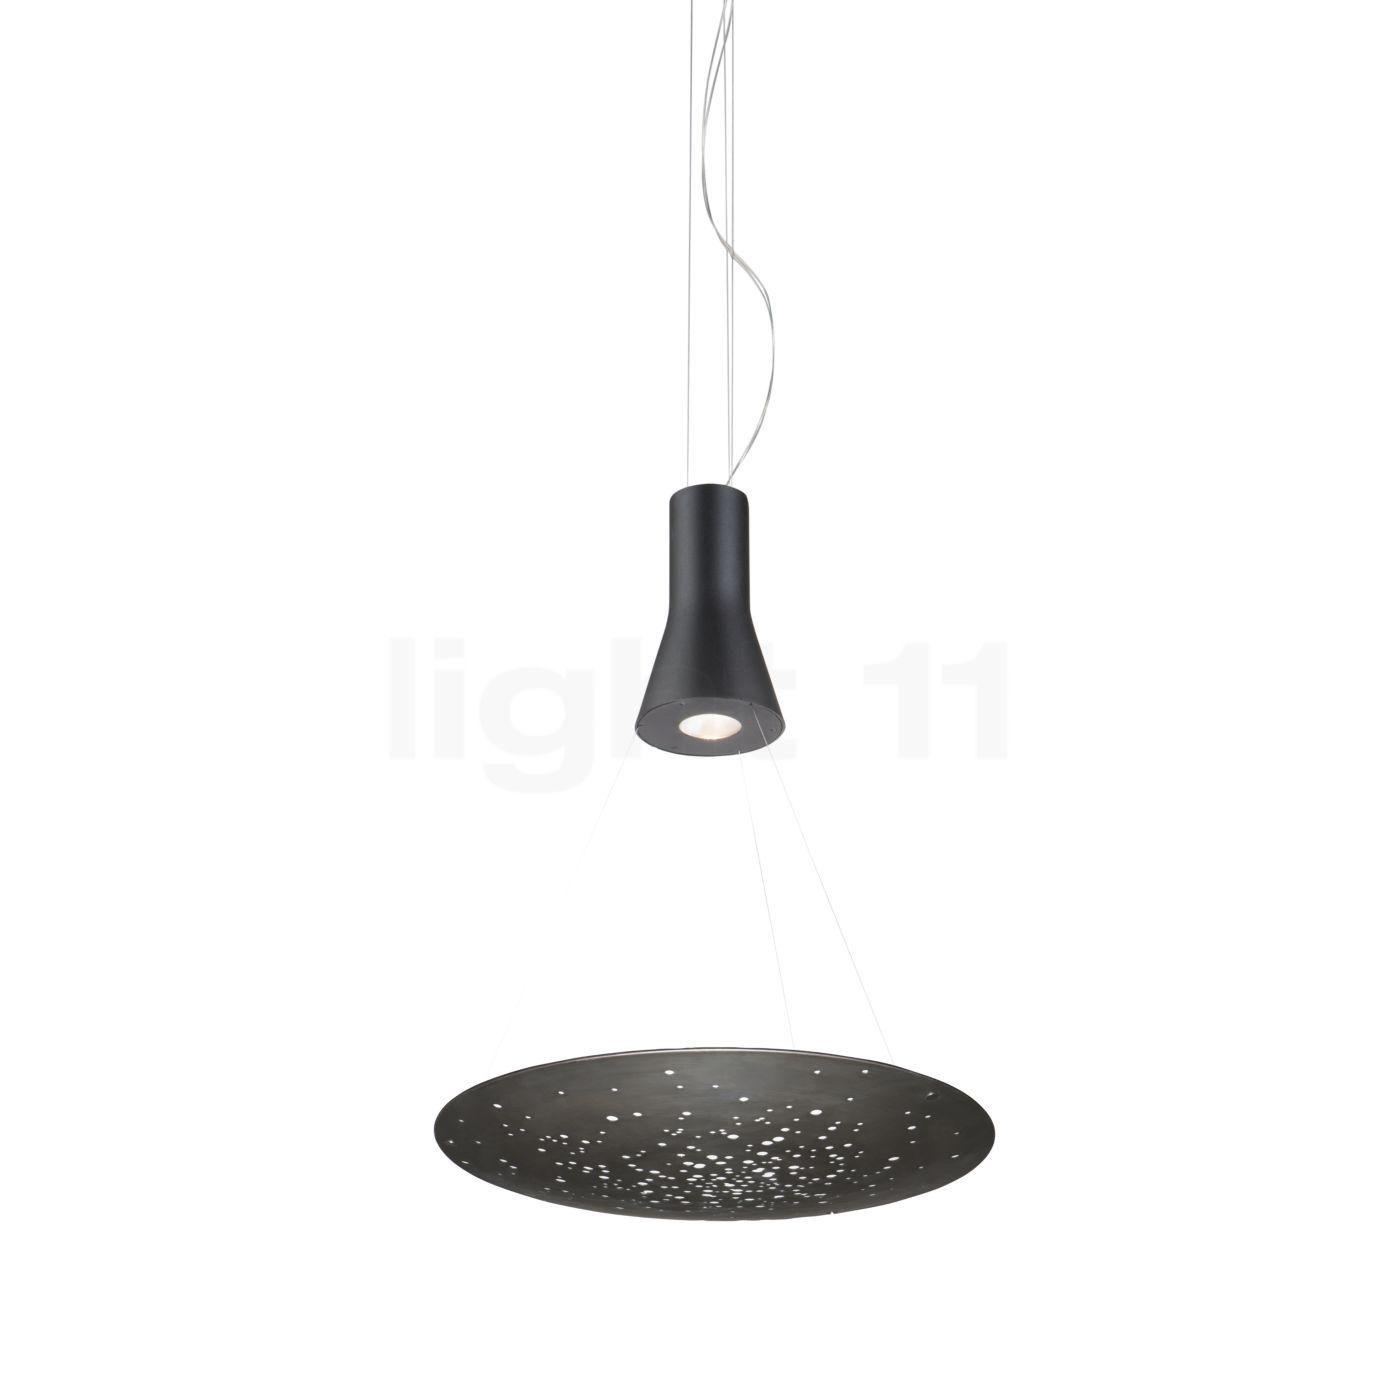 Fabbian Lens LED, Satinlack poliert, 60 cm F46 A01 14